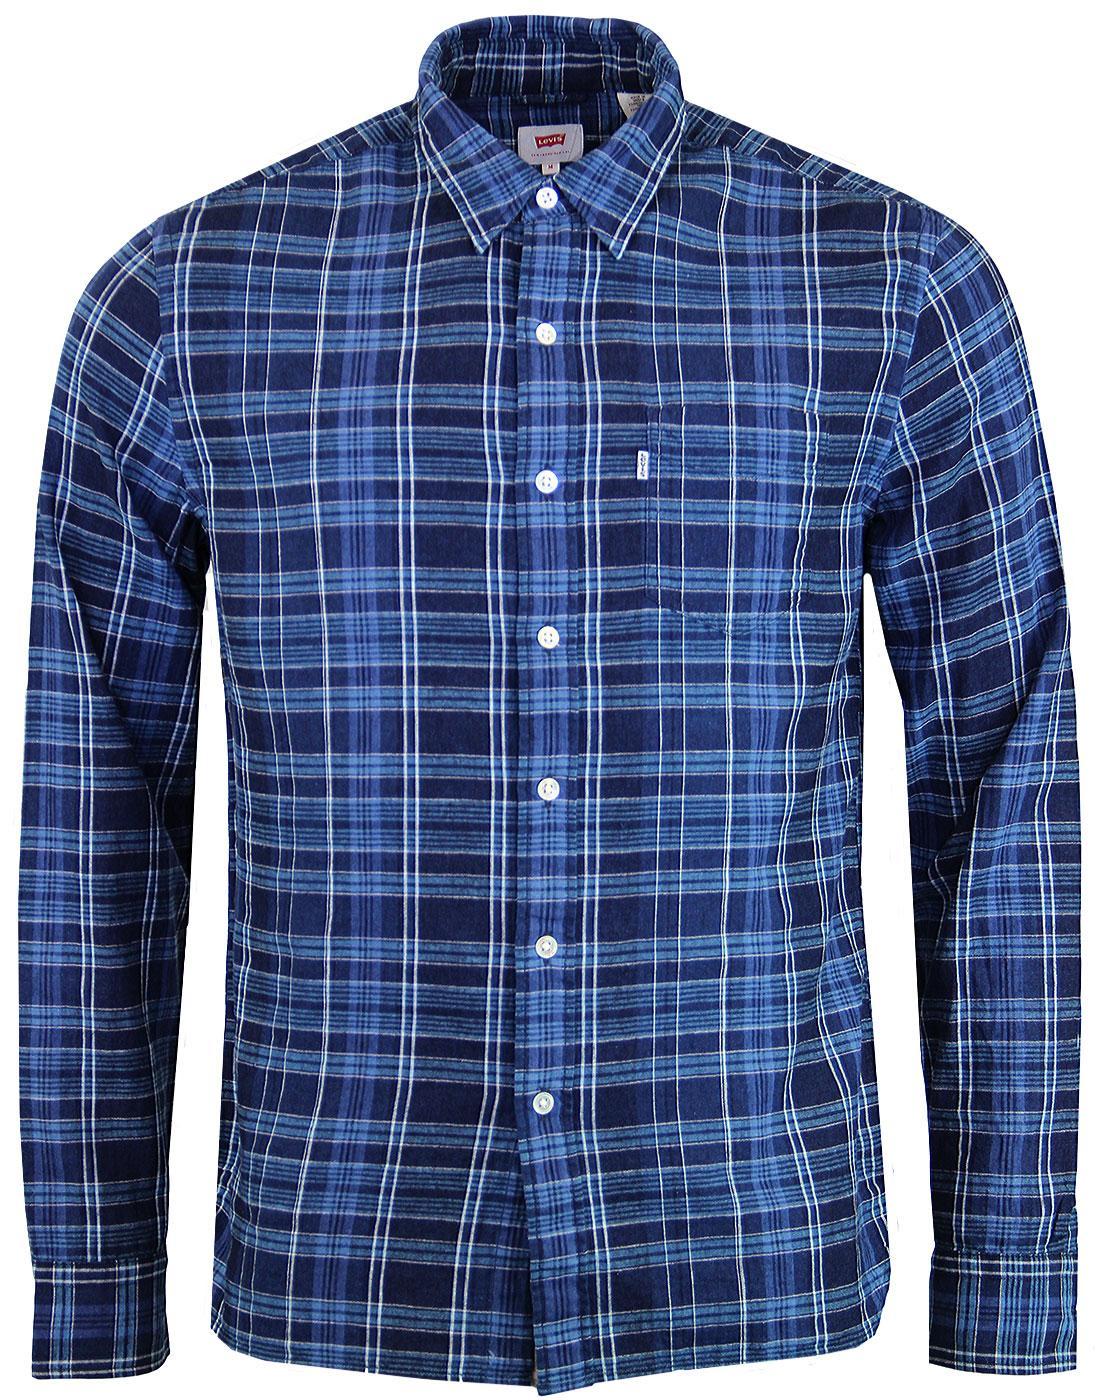 LEVI'S Sunset Pocket Indigo Dye Linen Check Shirt